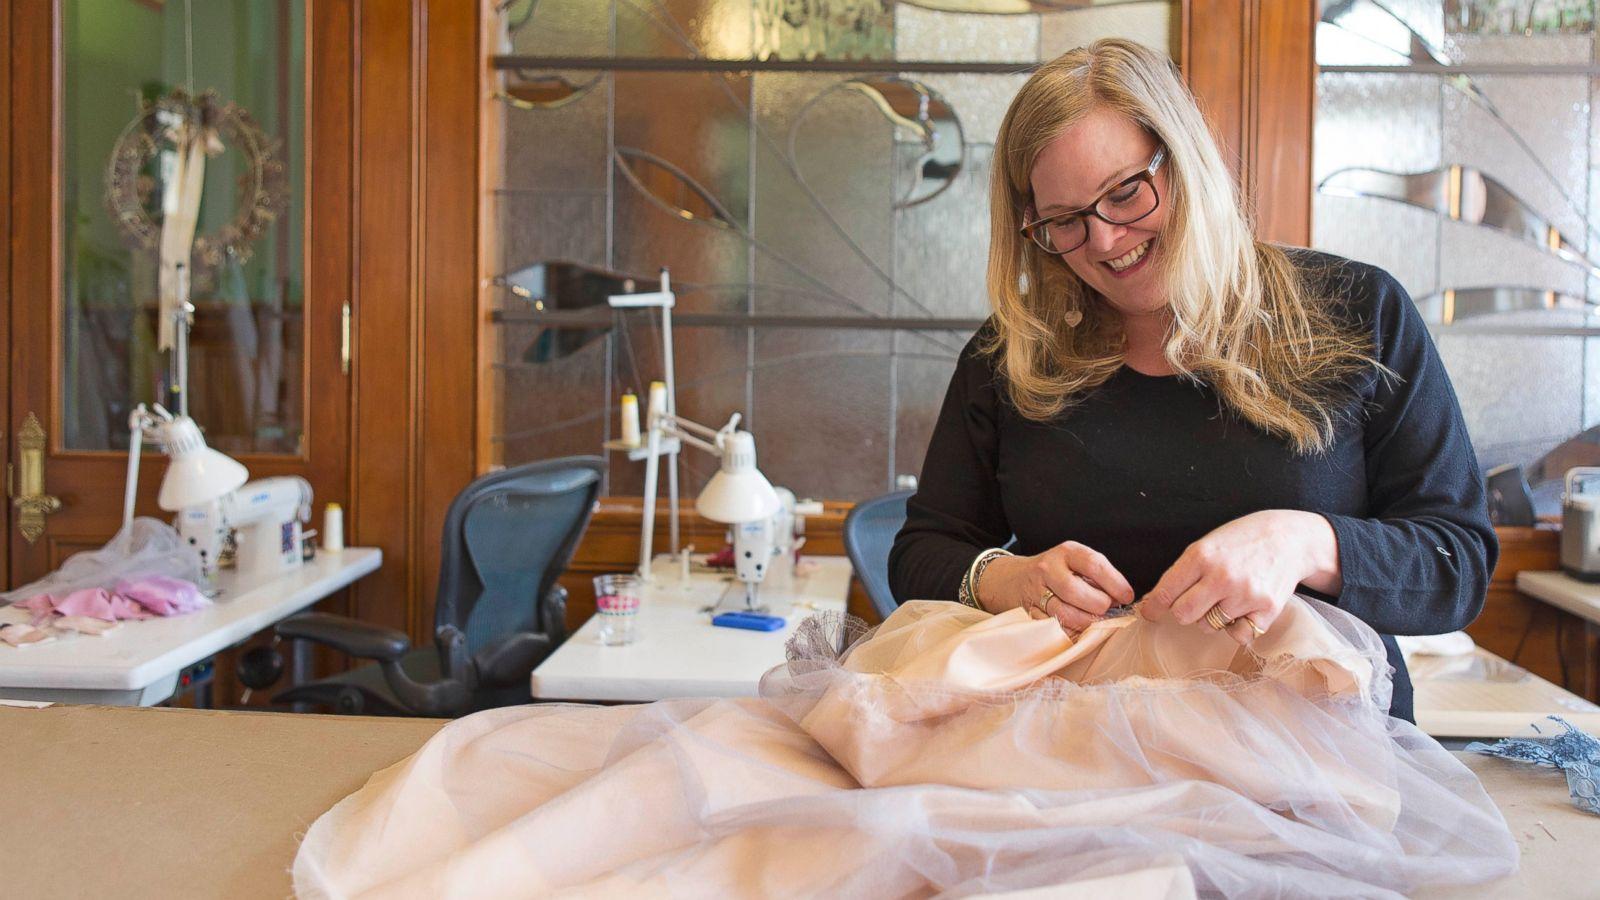 Wedding Dress Designer Helps With New Ebola Suit - ABC News